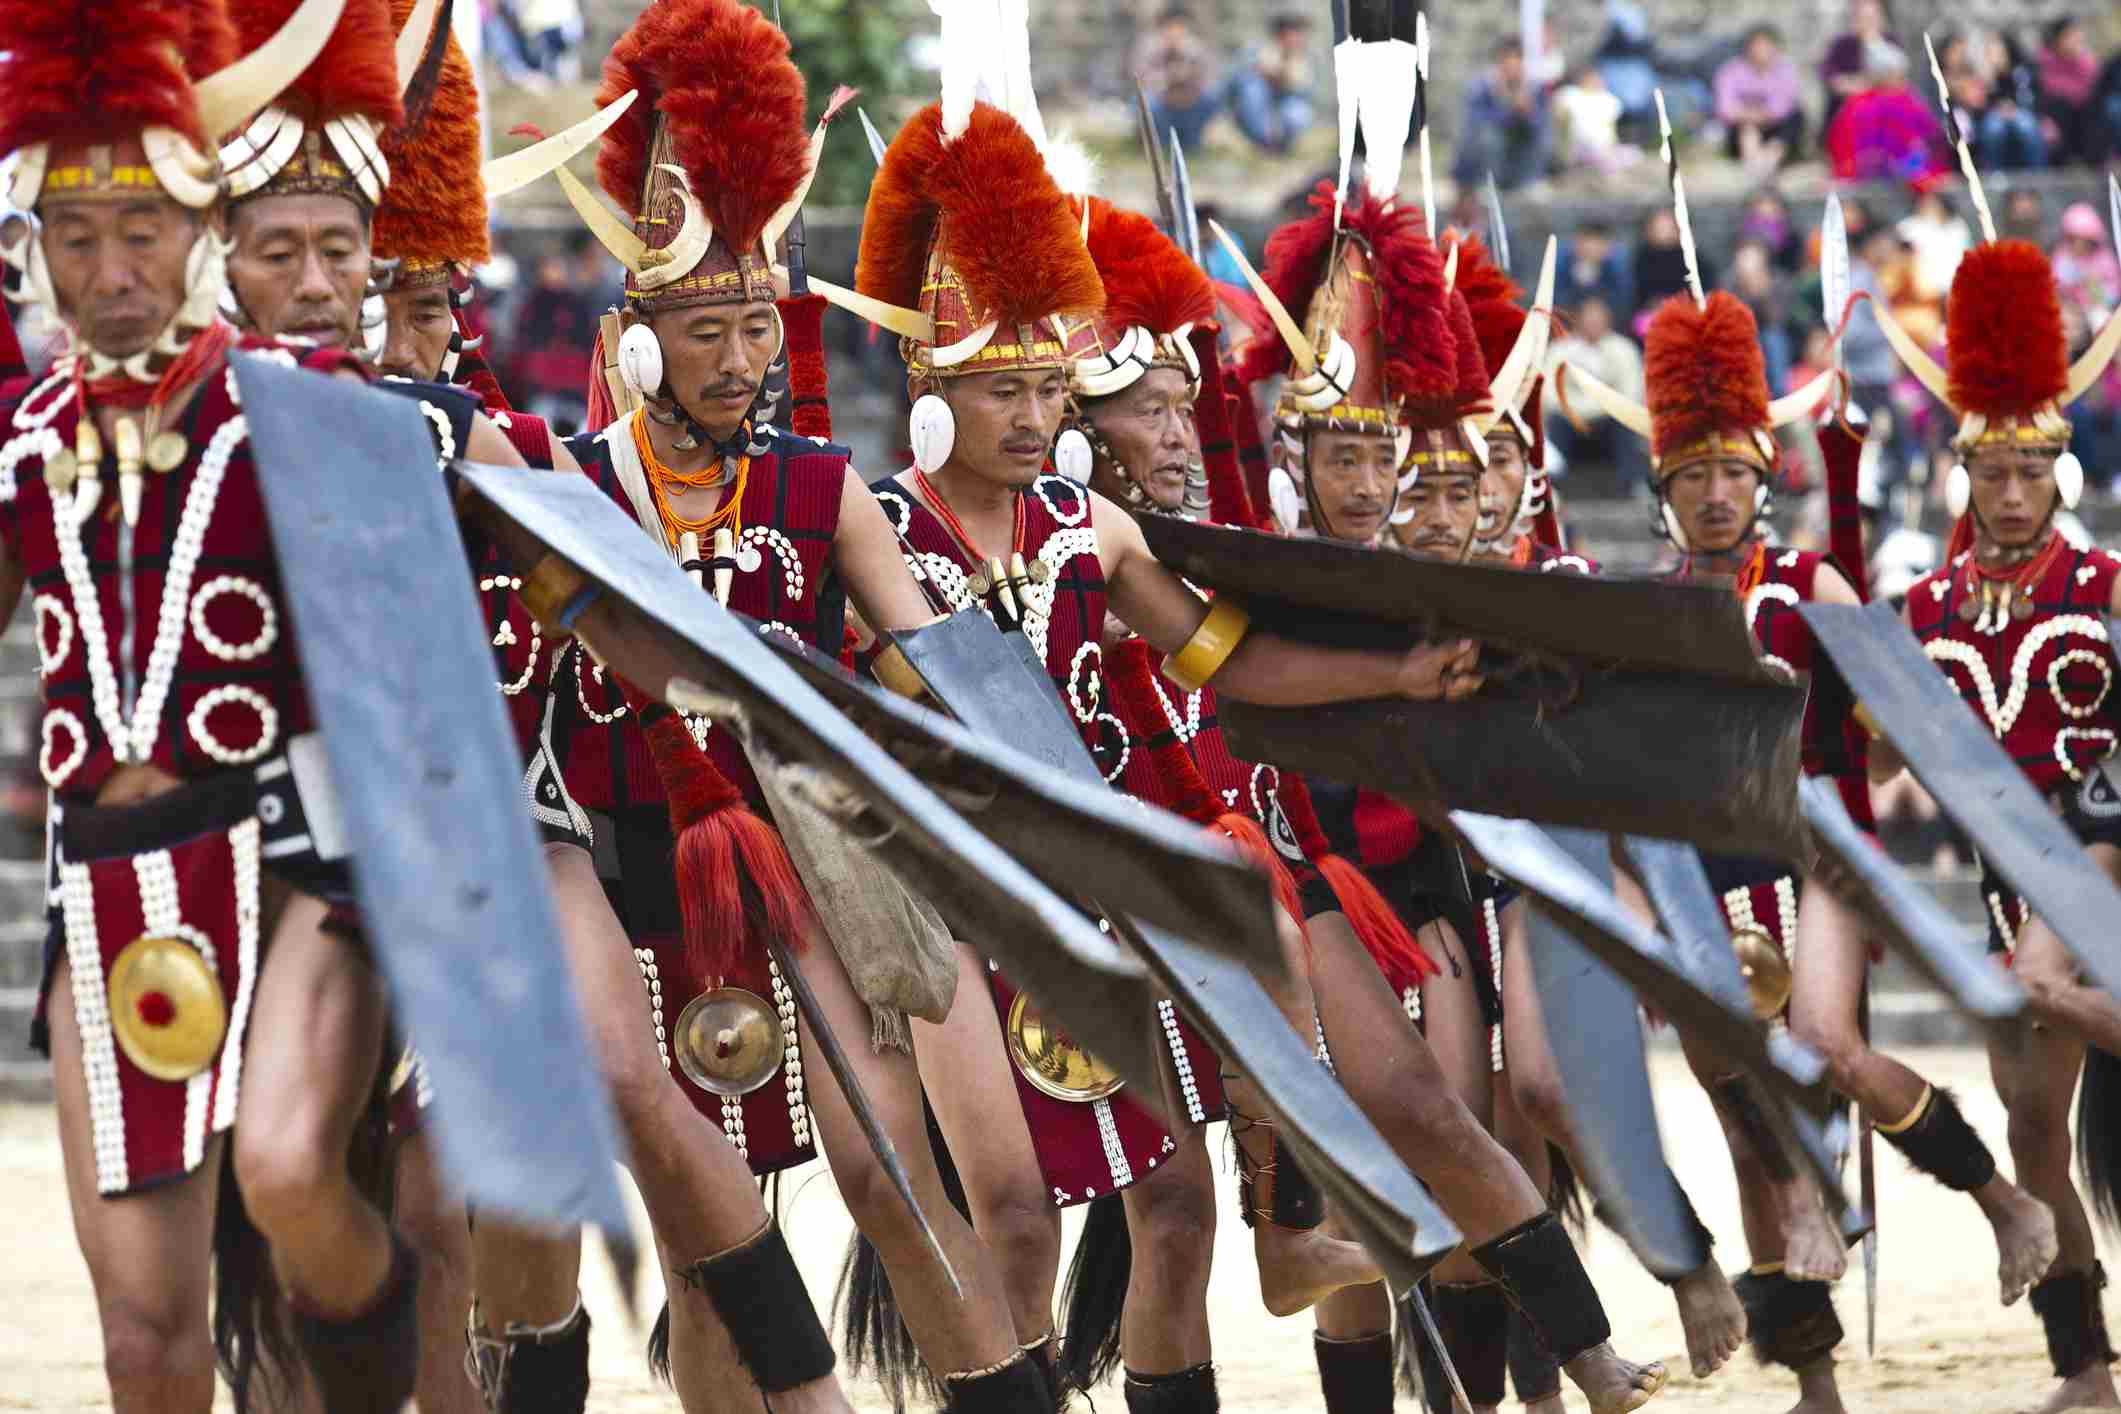 Naga warriors from Khiamniungam tribe performing traditional dance at Hornbill Festival.